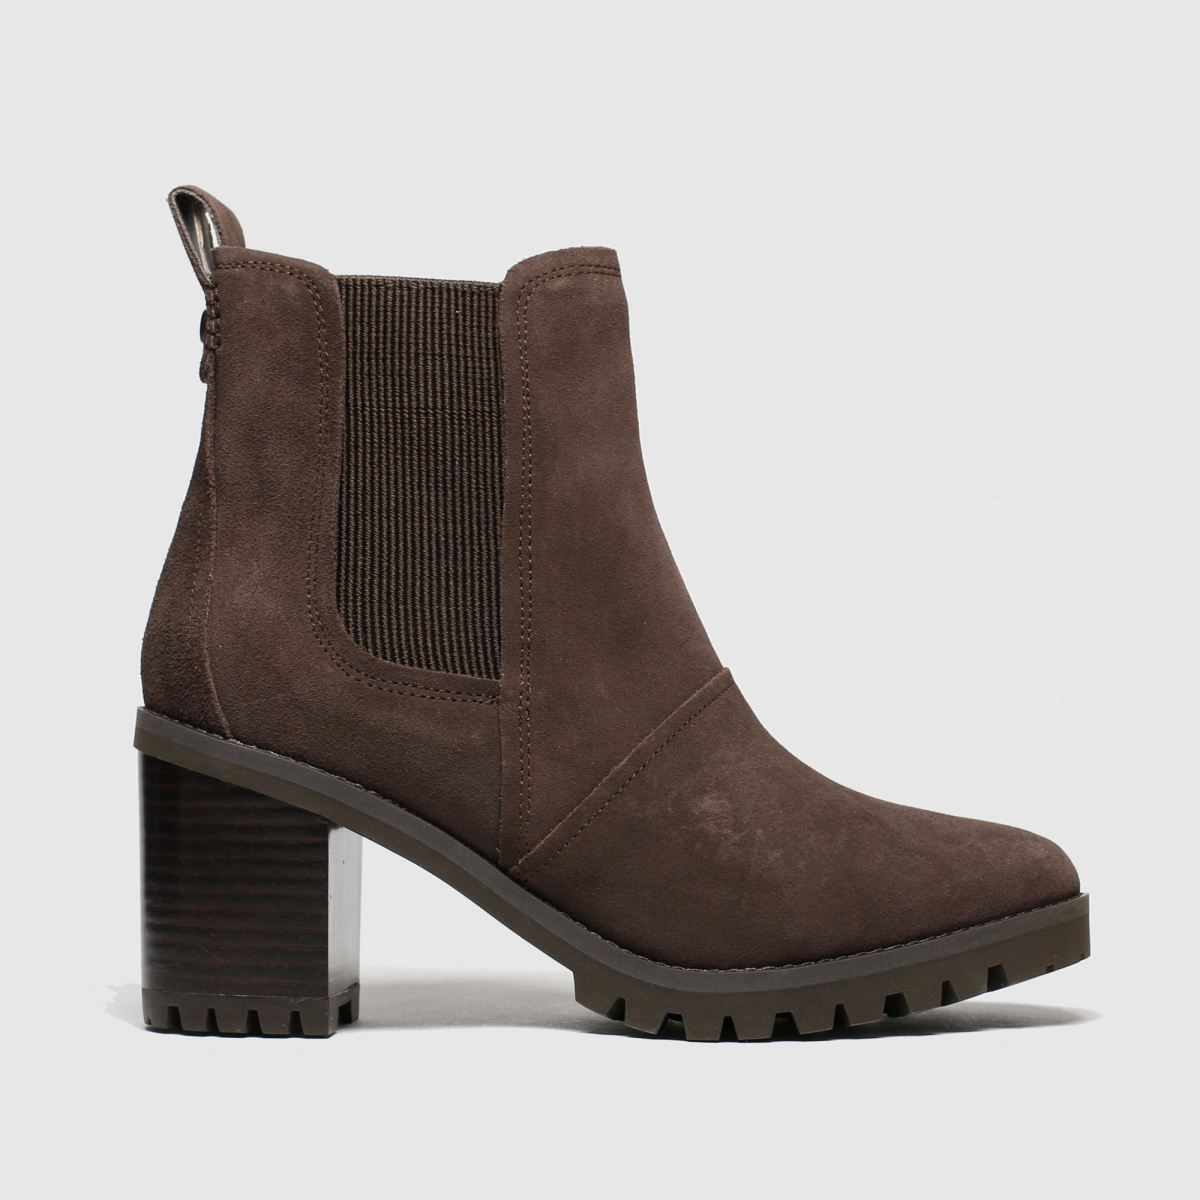 Ugg Brown Hazel Boots